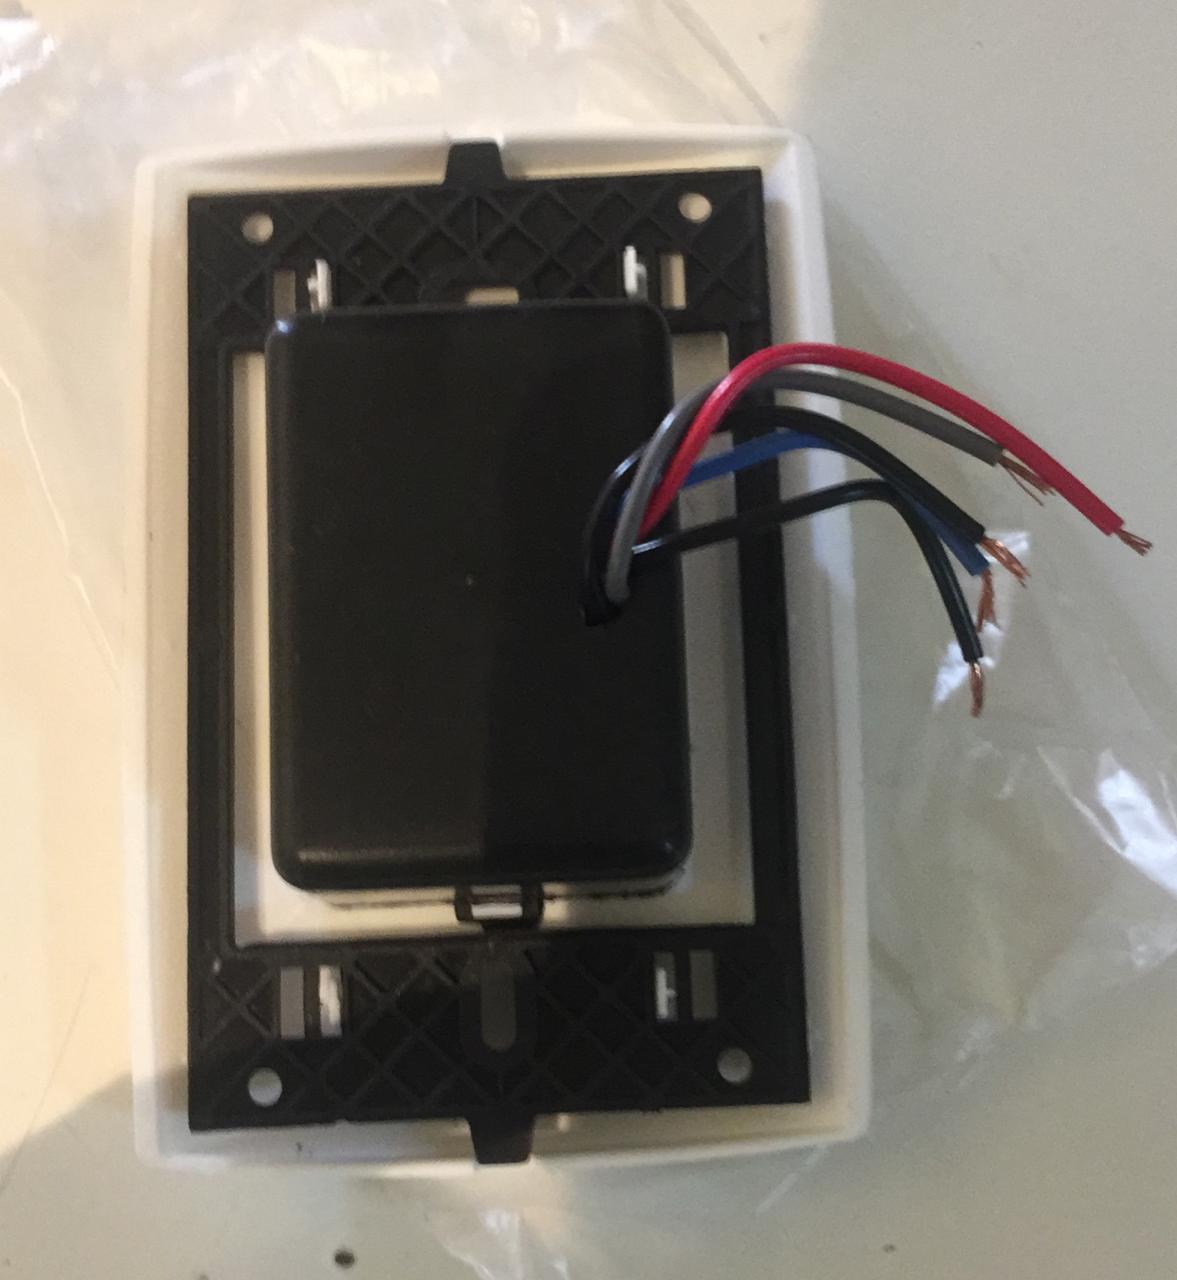 Controle Chave Deslizante para Ventilador Teto Bivolt